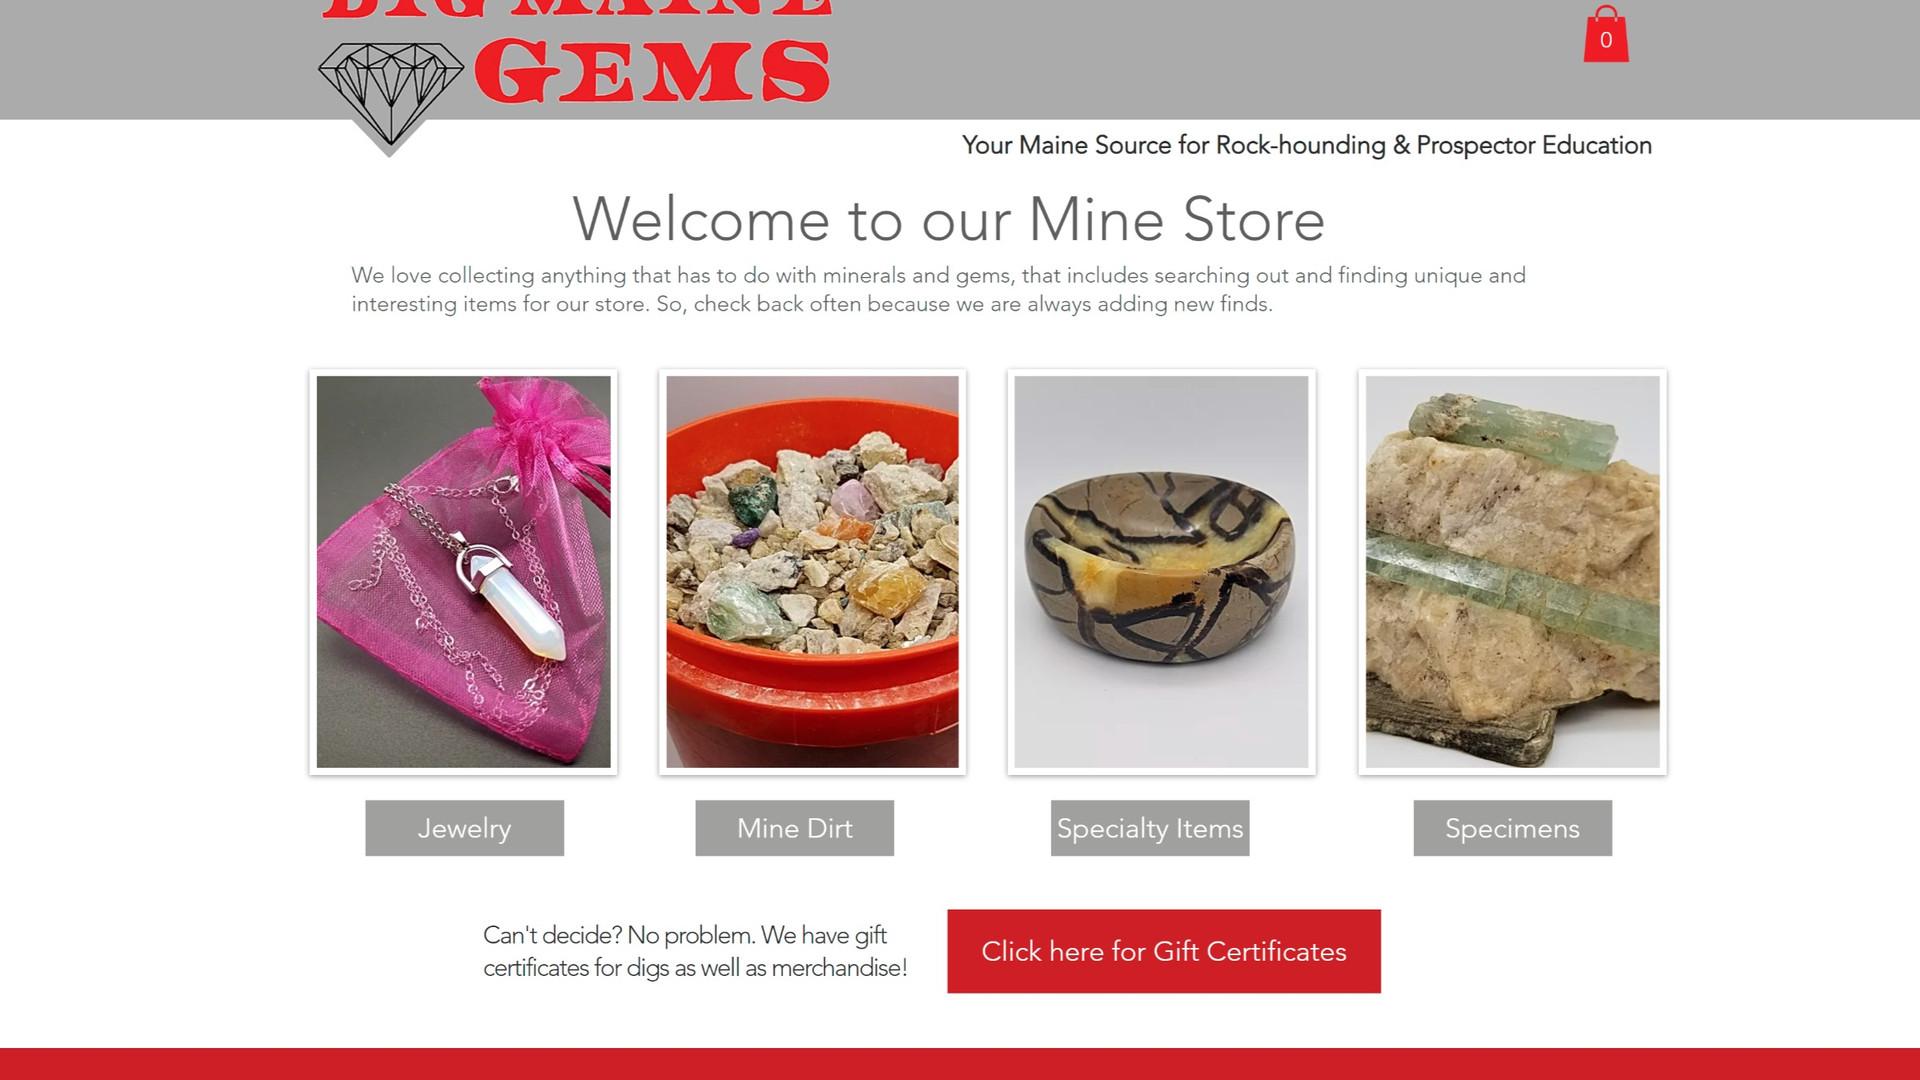 screencapture-digmainegems-mine-store-20